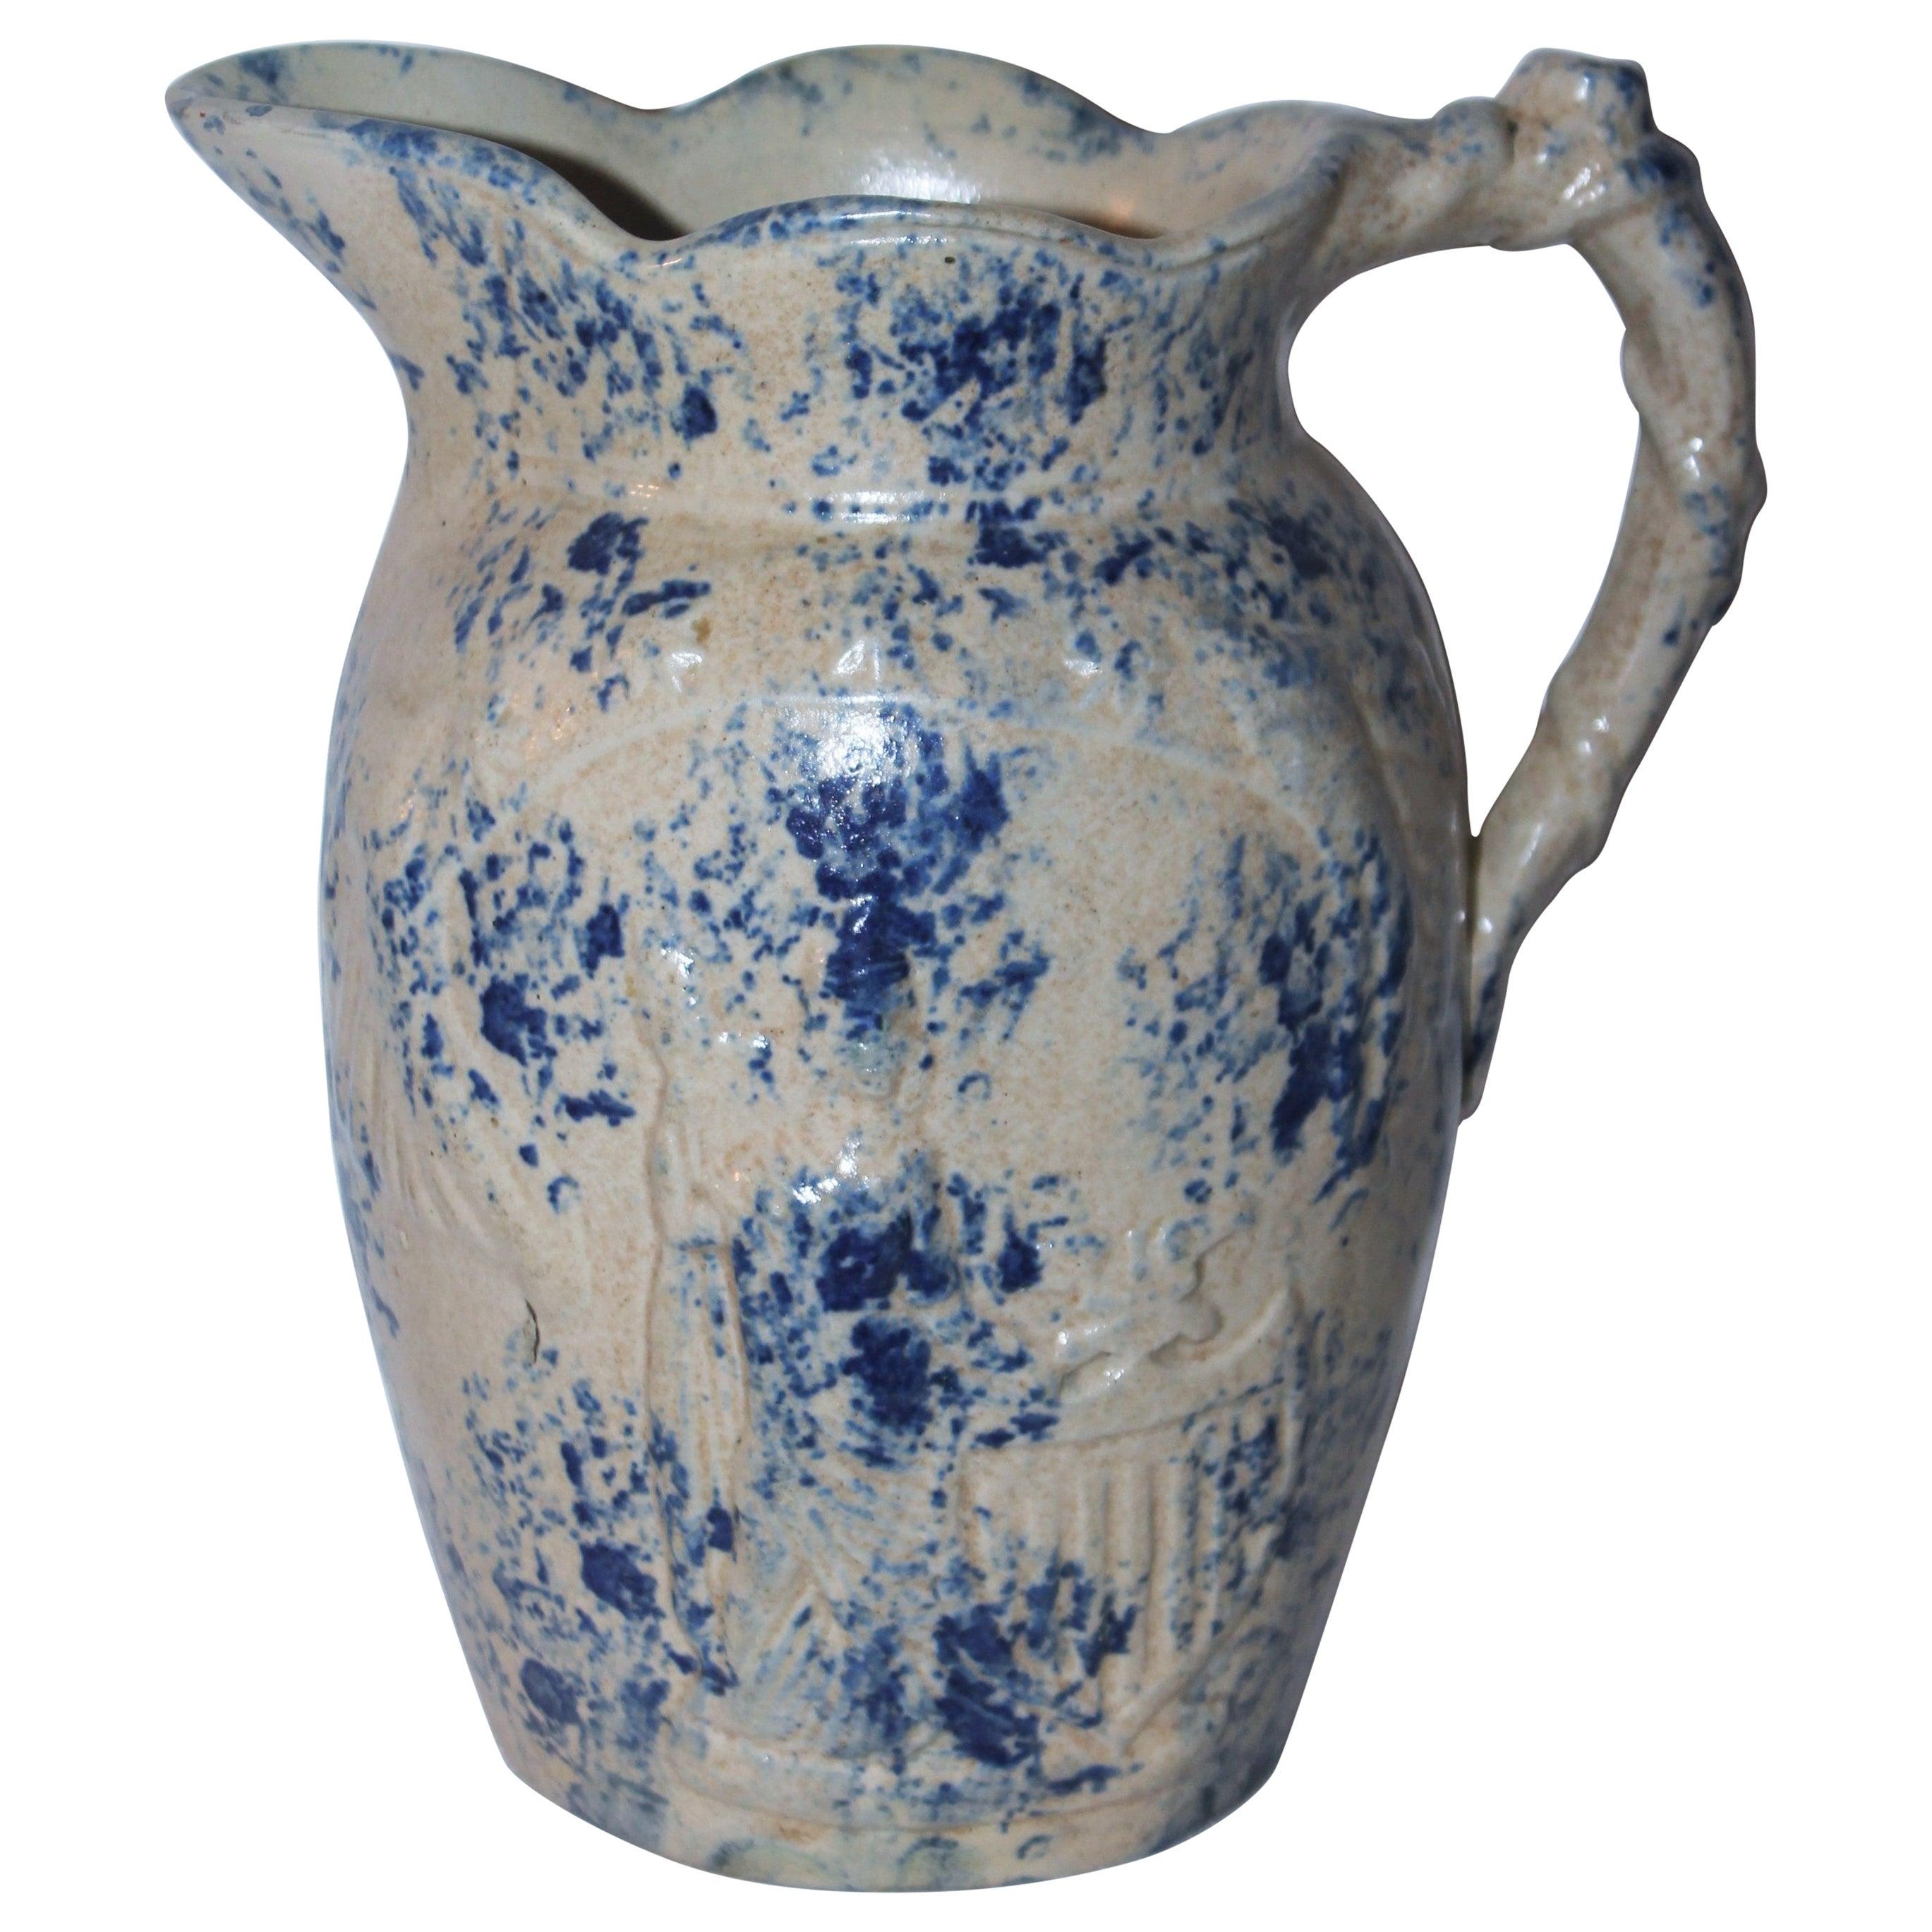 Rare 19th Century Lady Liberty Blue Sponge Ware Pitcher